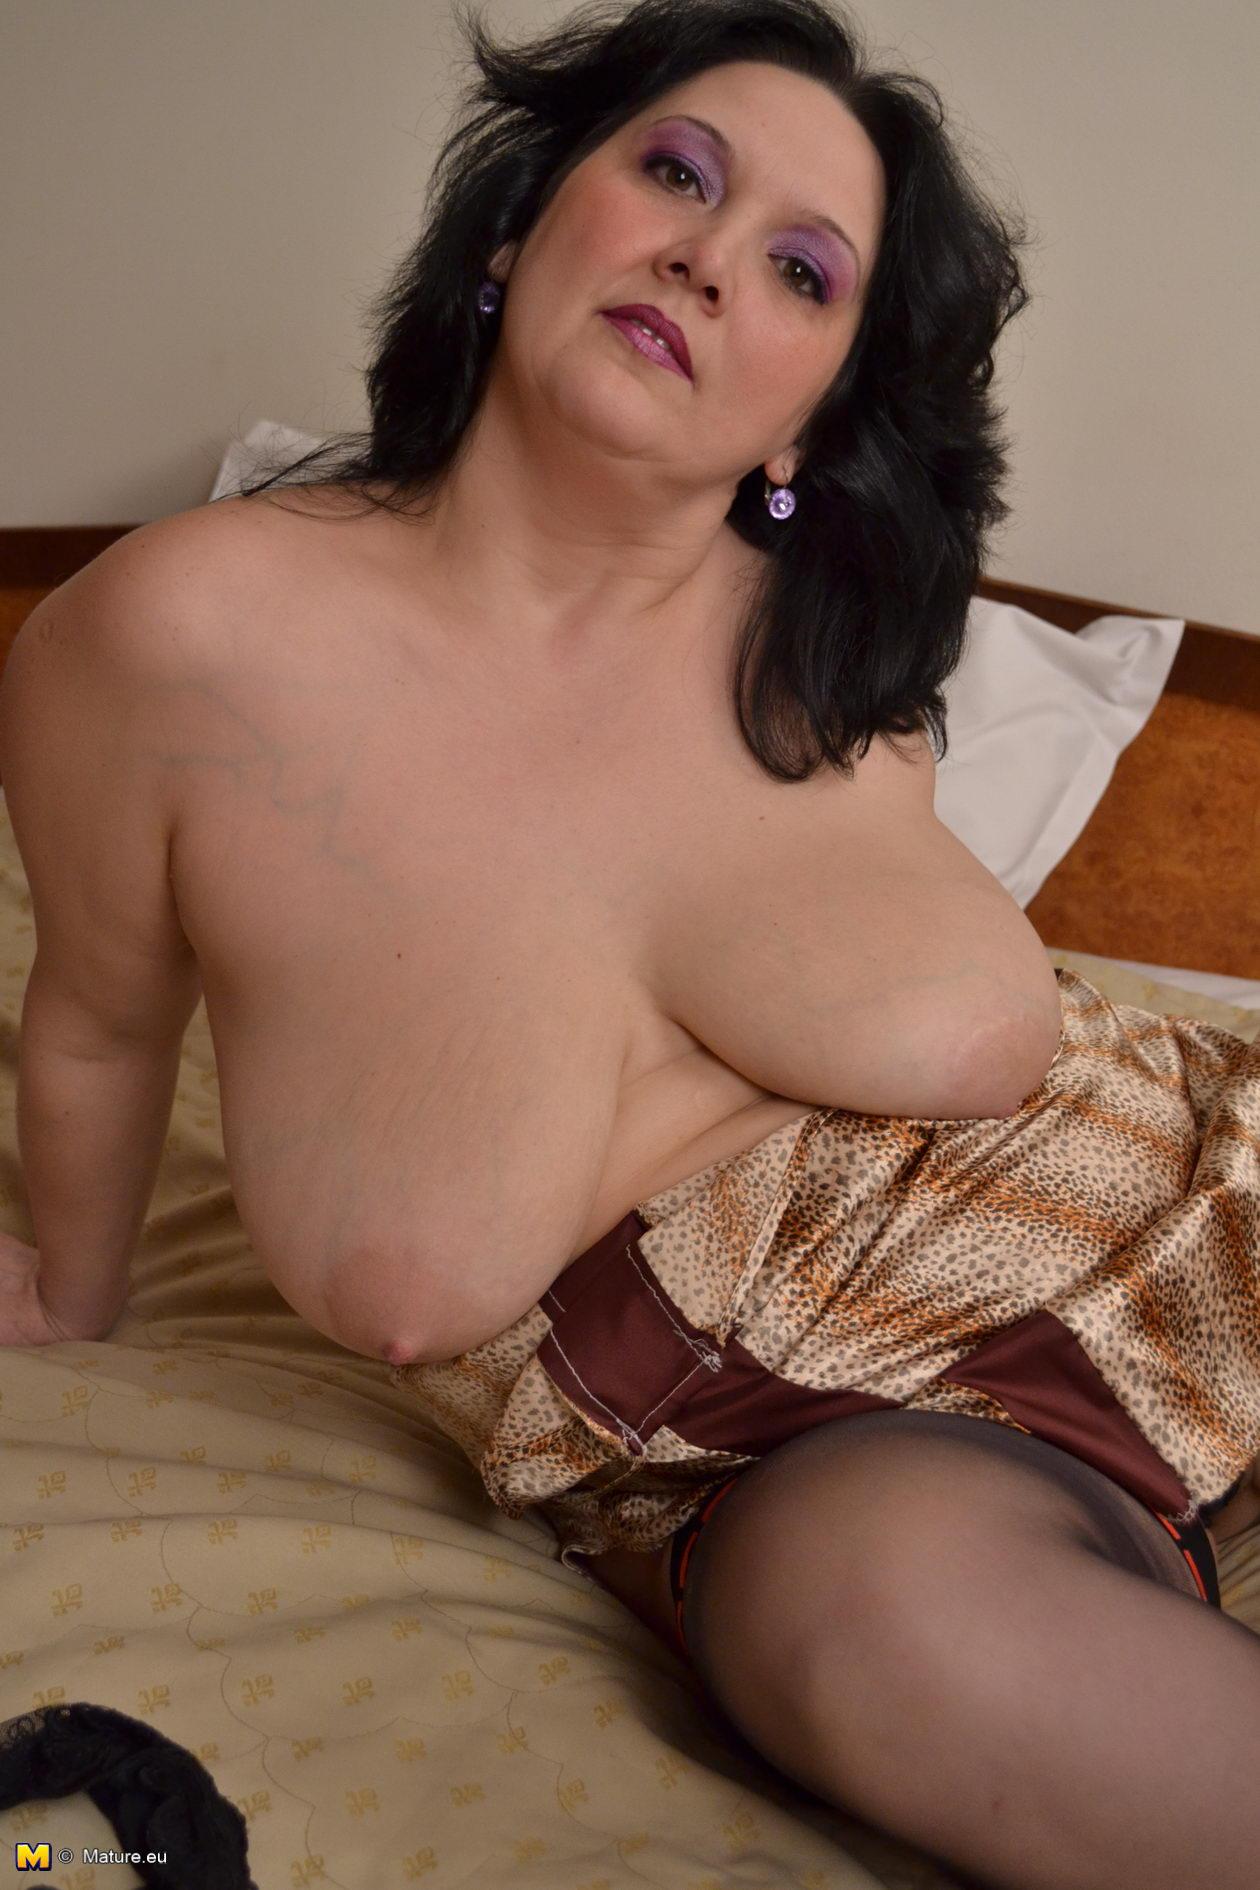 Mature sex pussy pics